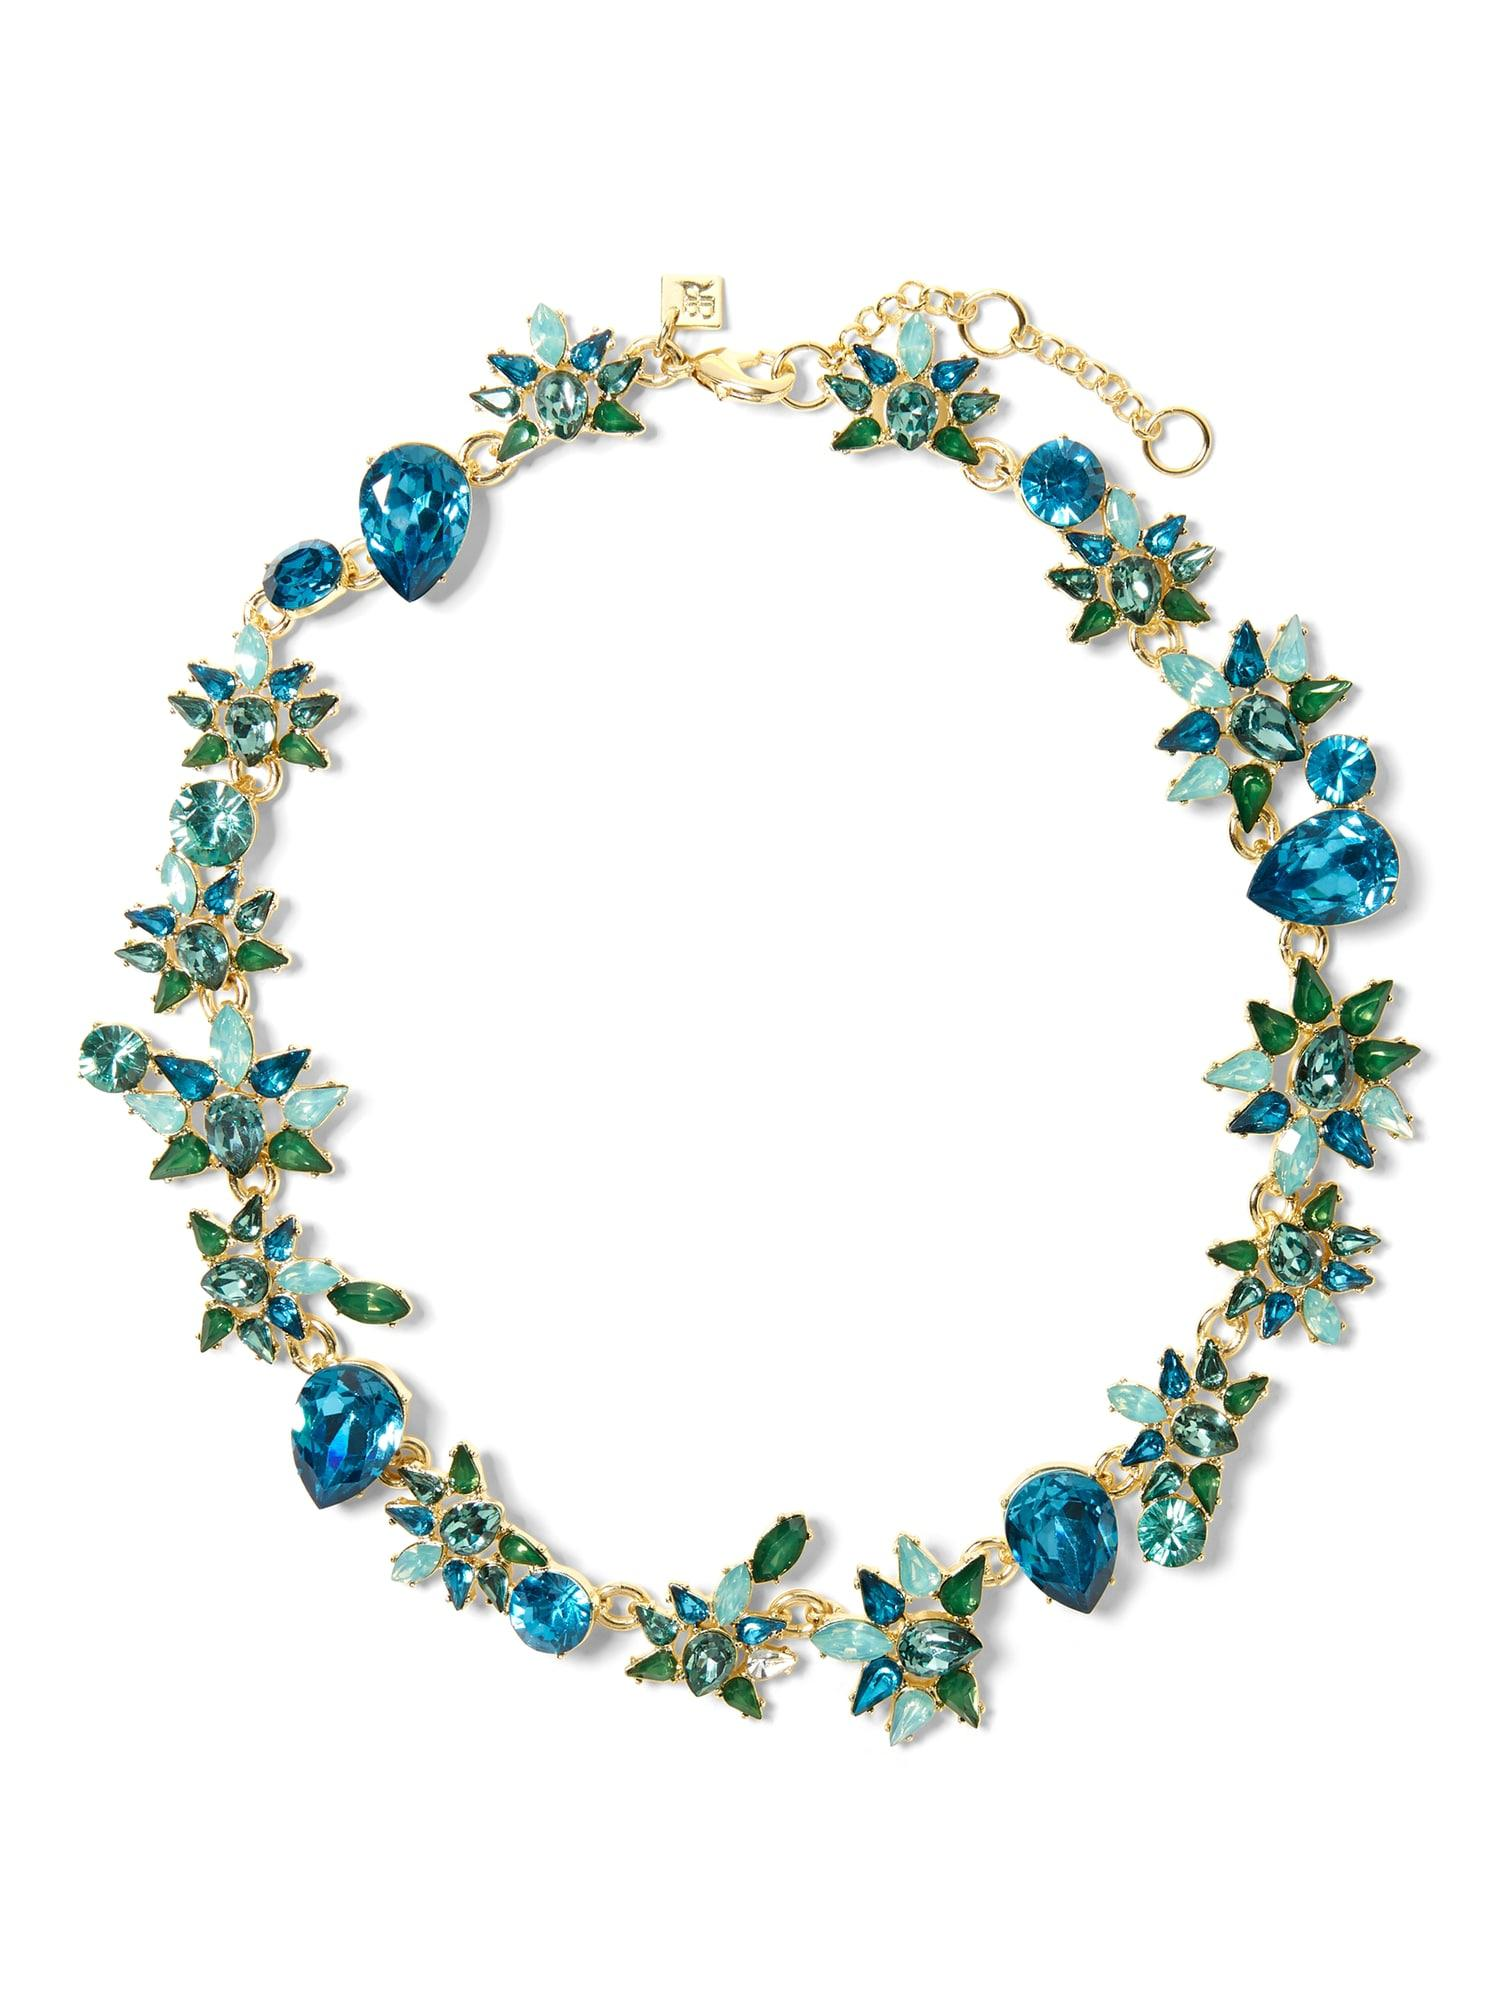 21a0f72163f8 Gallery. Women s Collar Necklaces Women s Swarovski Crystal ...